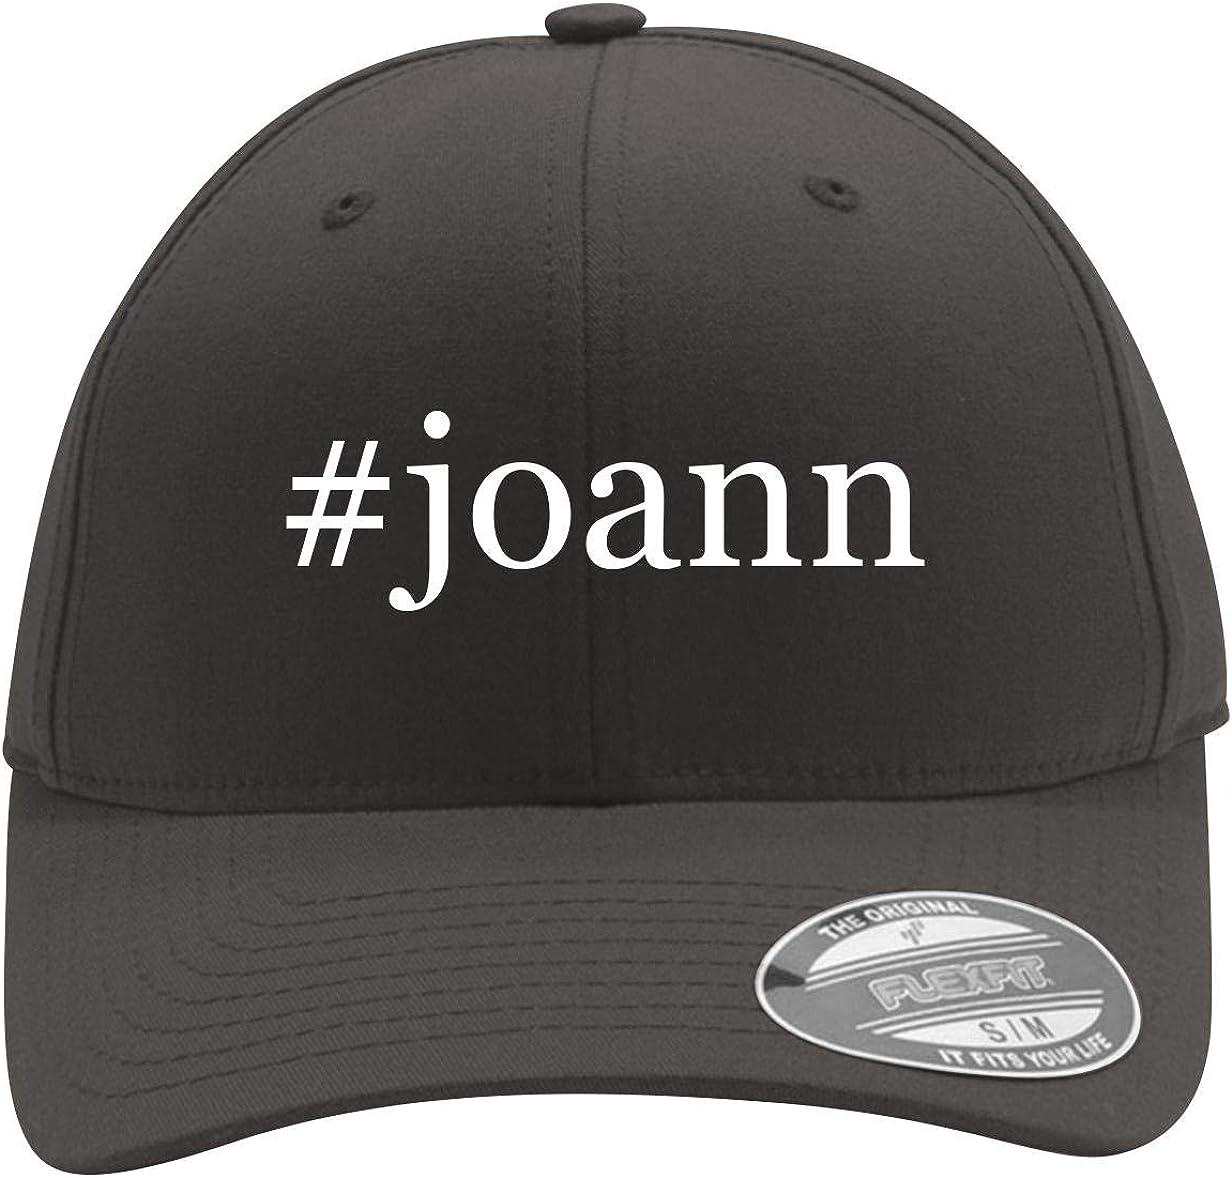 #Joann - Men's Hashtag Flexfit Baseball Cap Hat